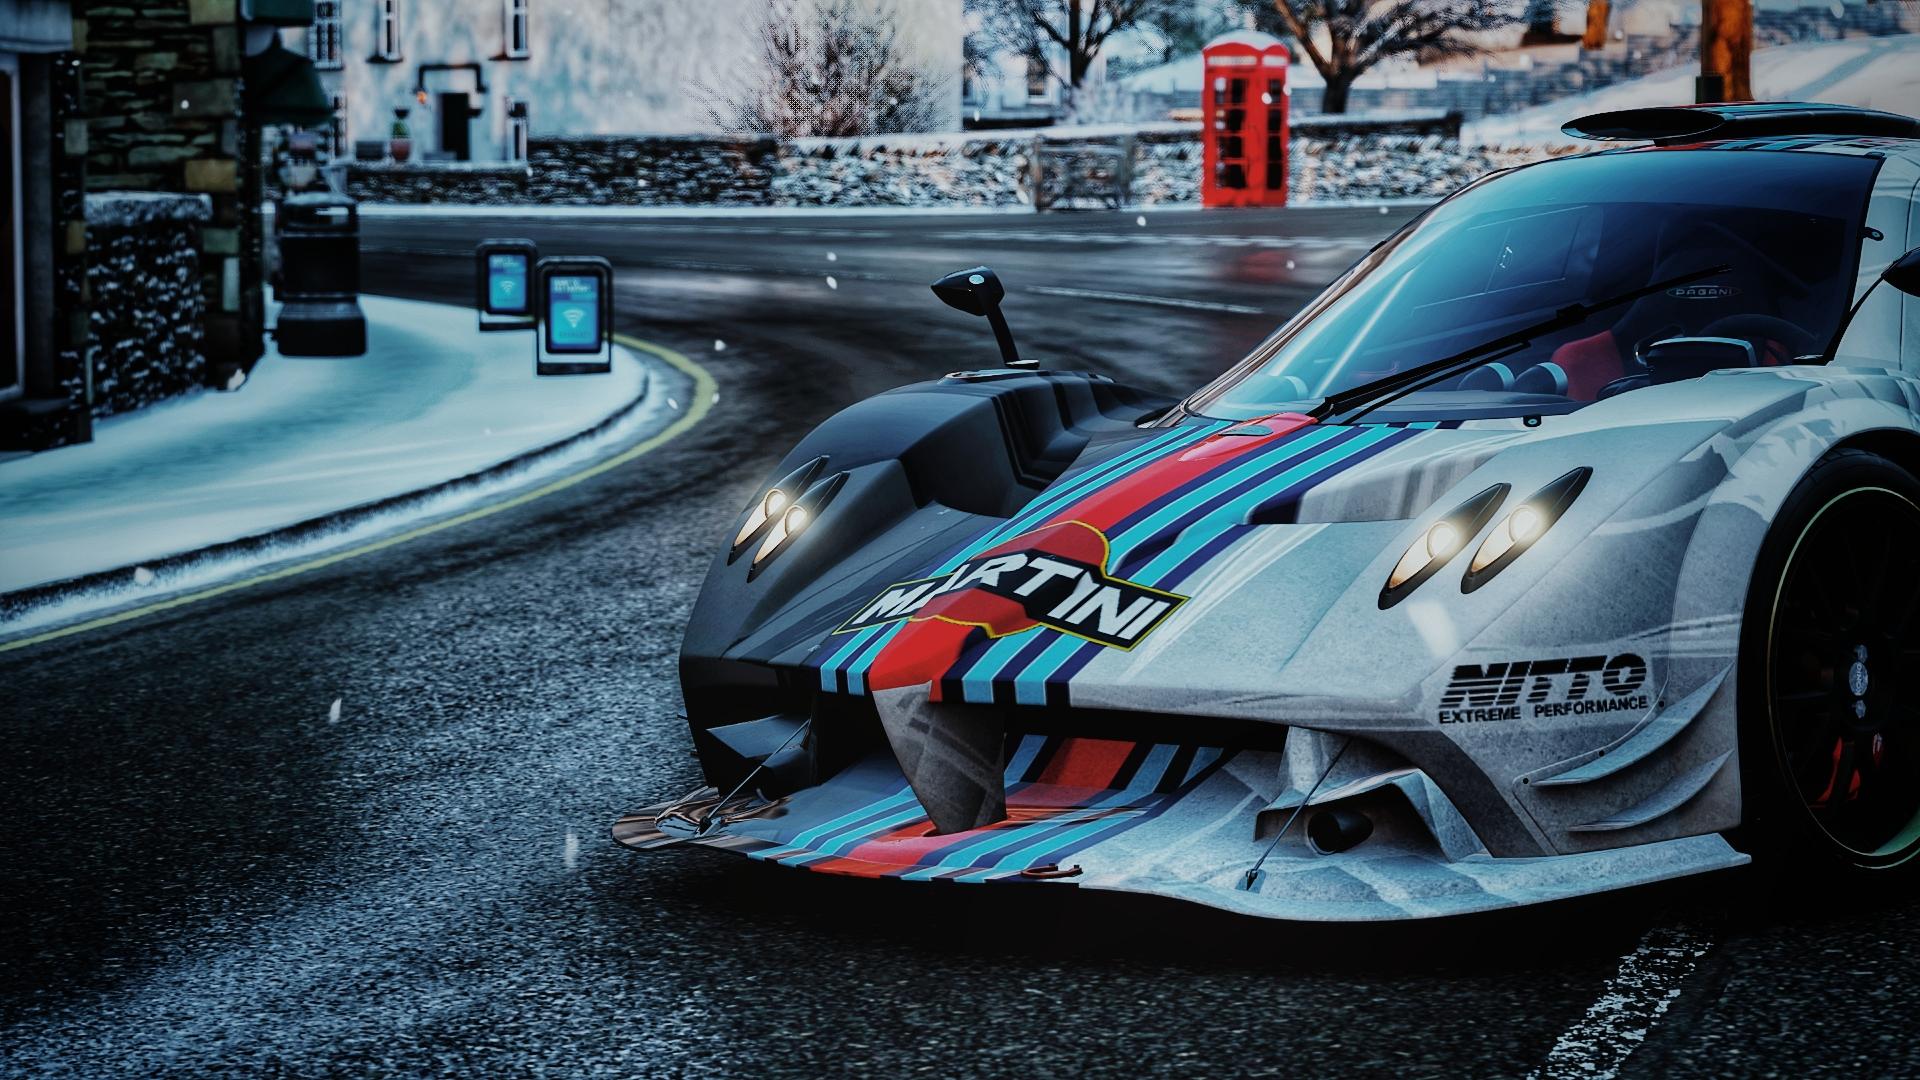 General 1920x1080 Pagani Pagani Zonda R Forza Horizon 4 car video games Martini Martini Racing design